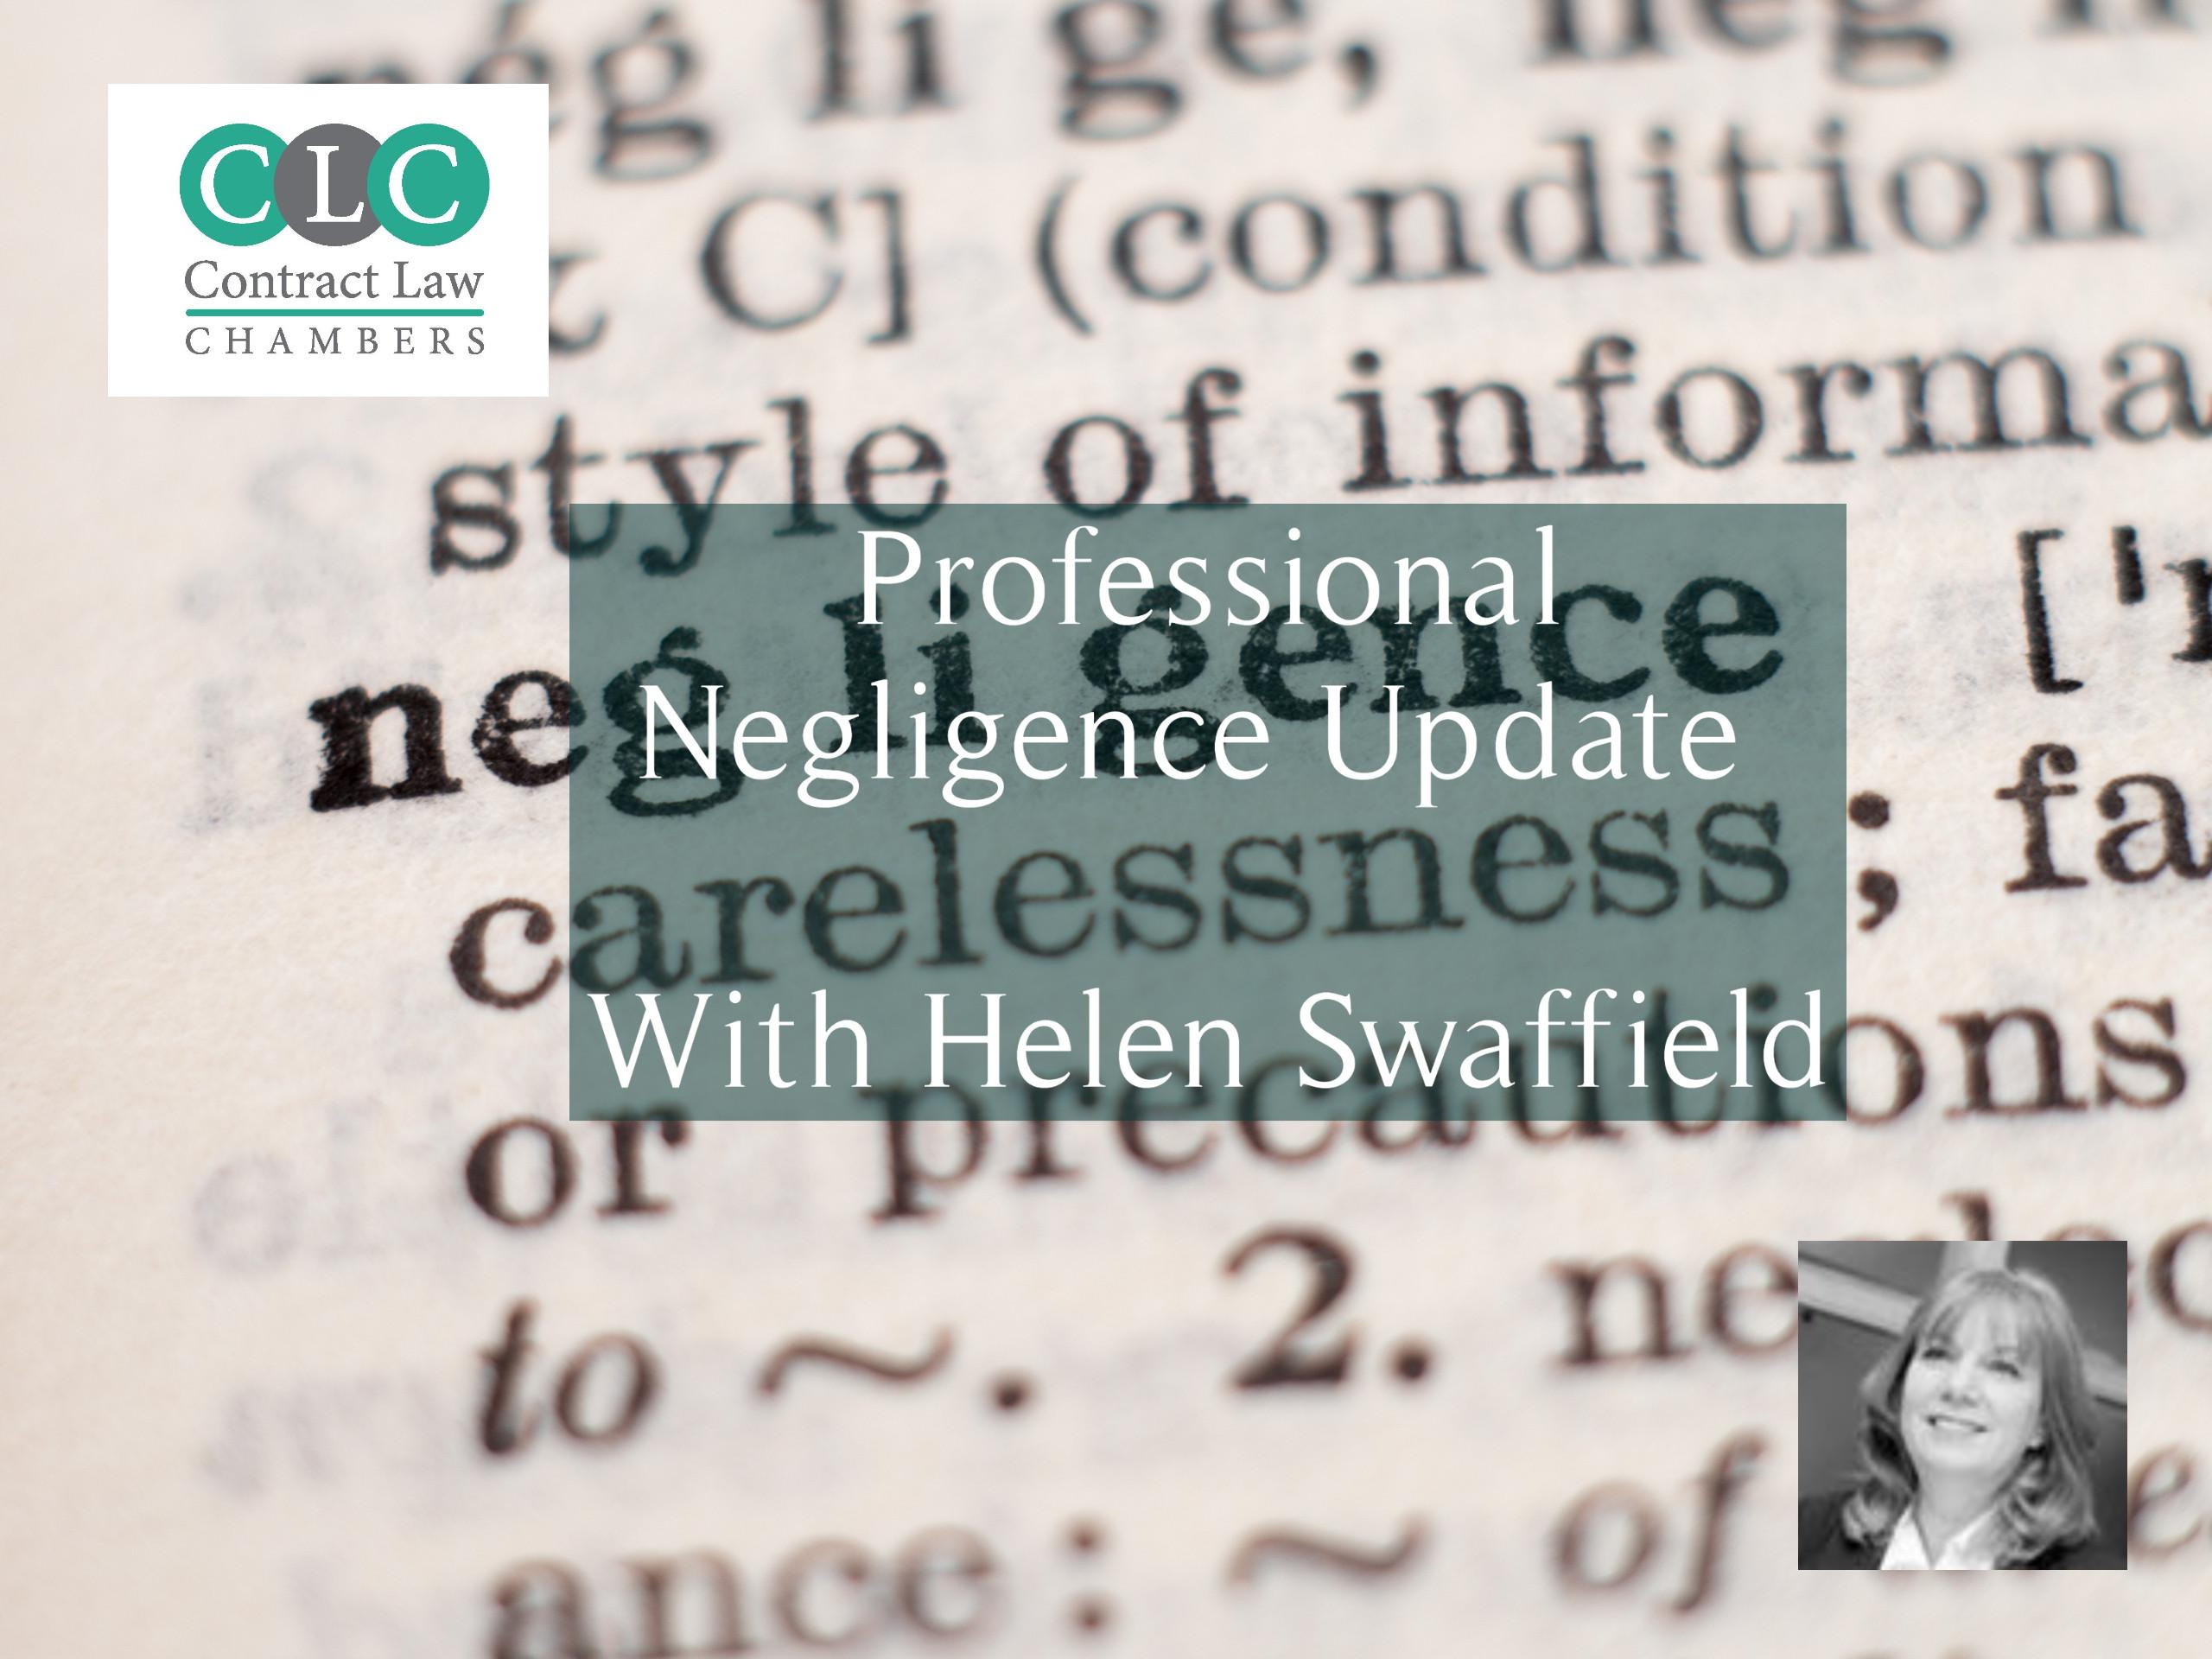 Professional Negligence Update